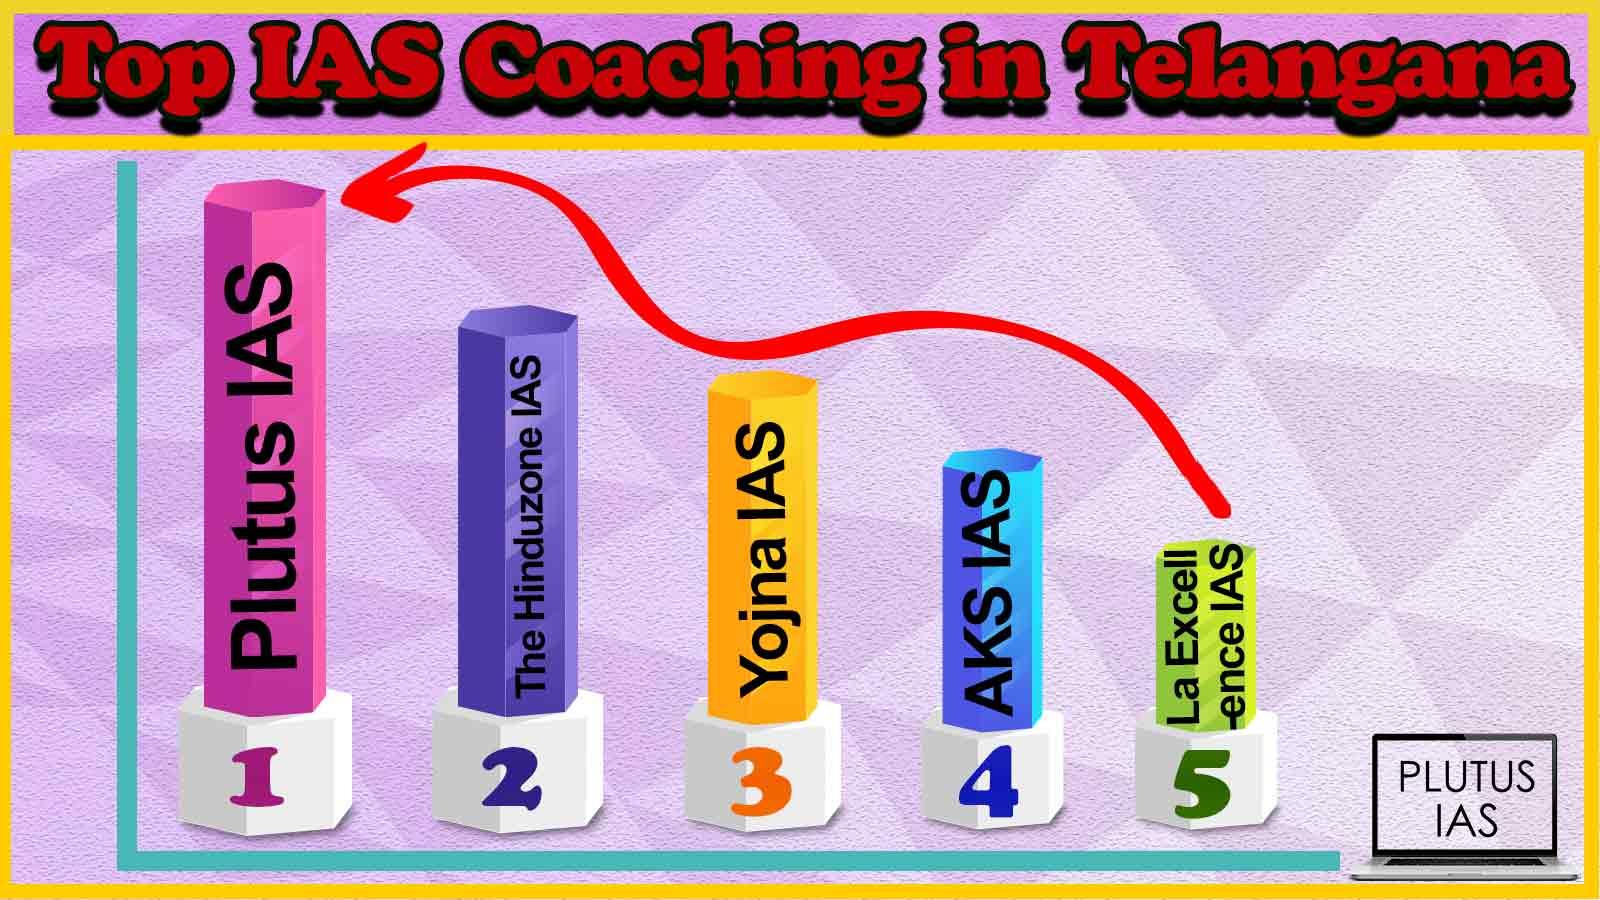 Top 10 IAS Coaching in Telangana